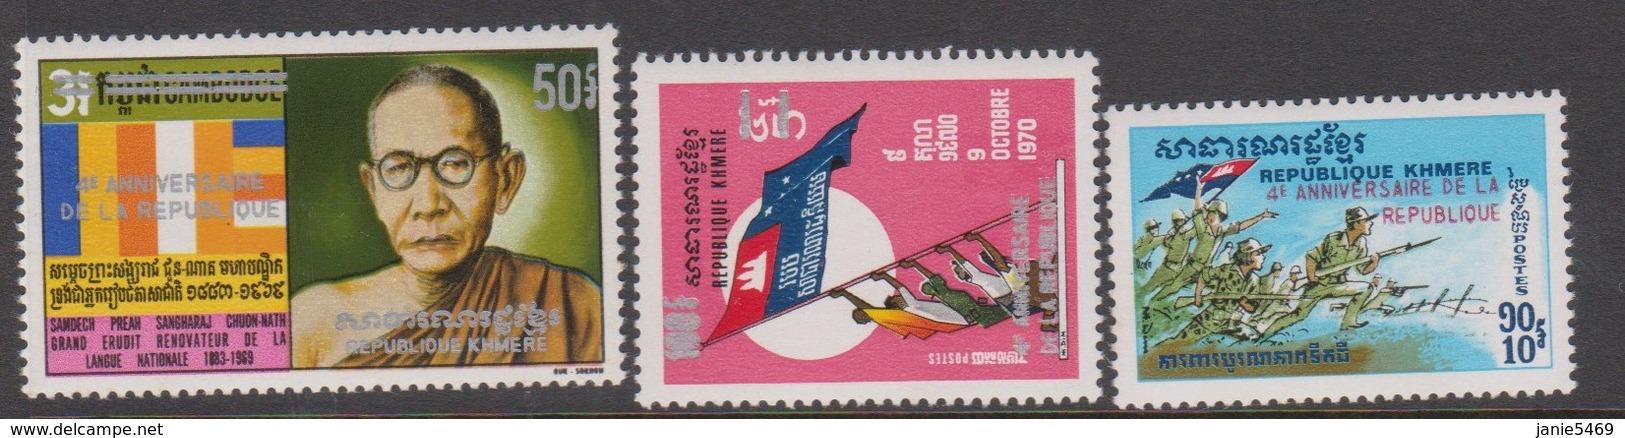 Cambodia Scott 321-323  1974 4th Anniversary Of The Republic ,mint Never Hinged - Cambodia